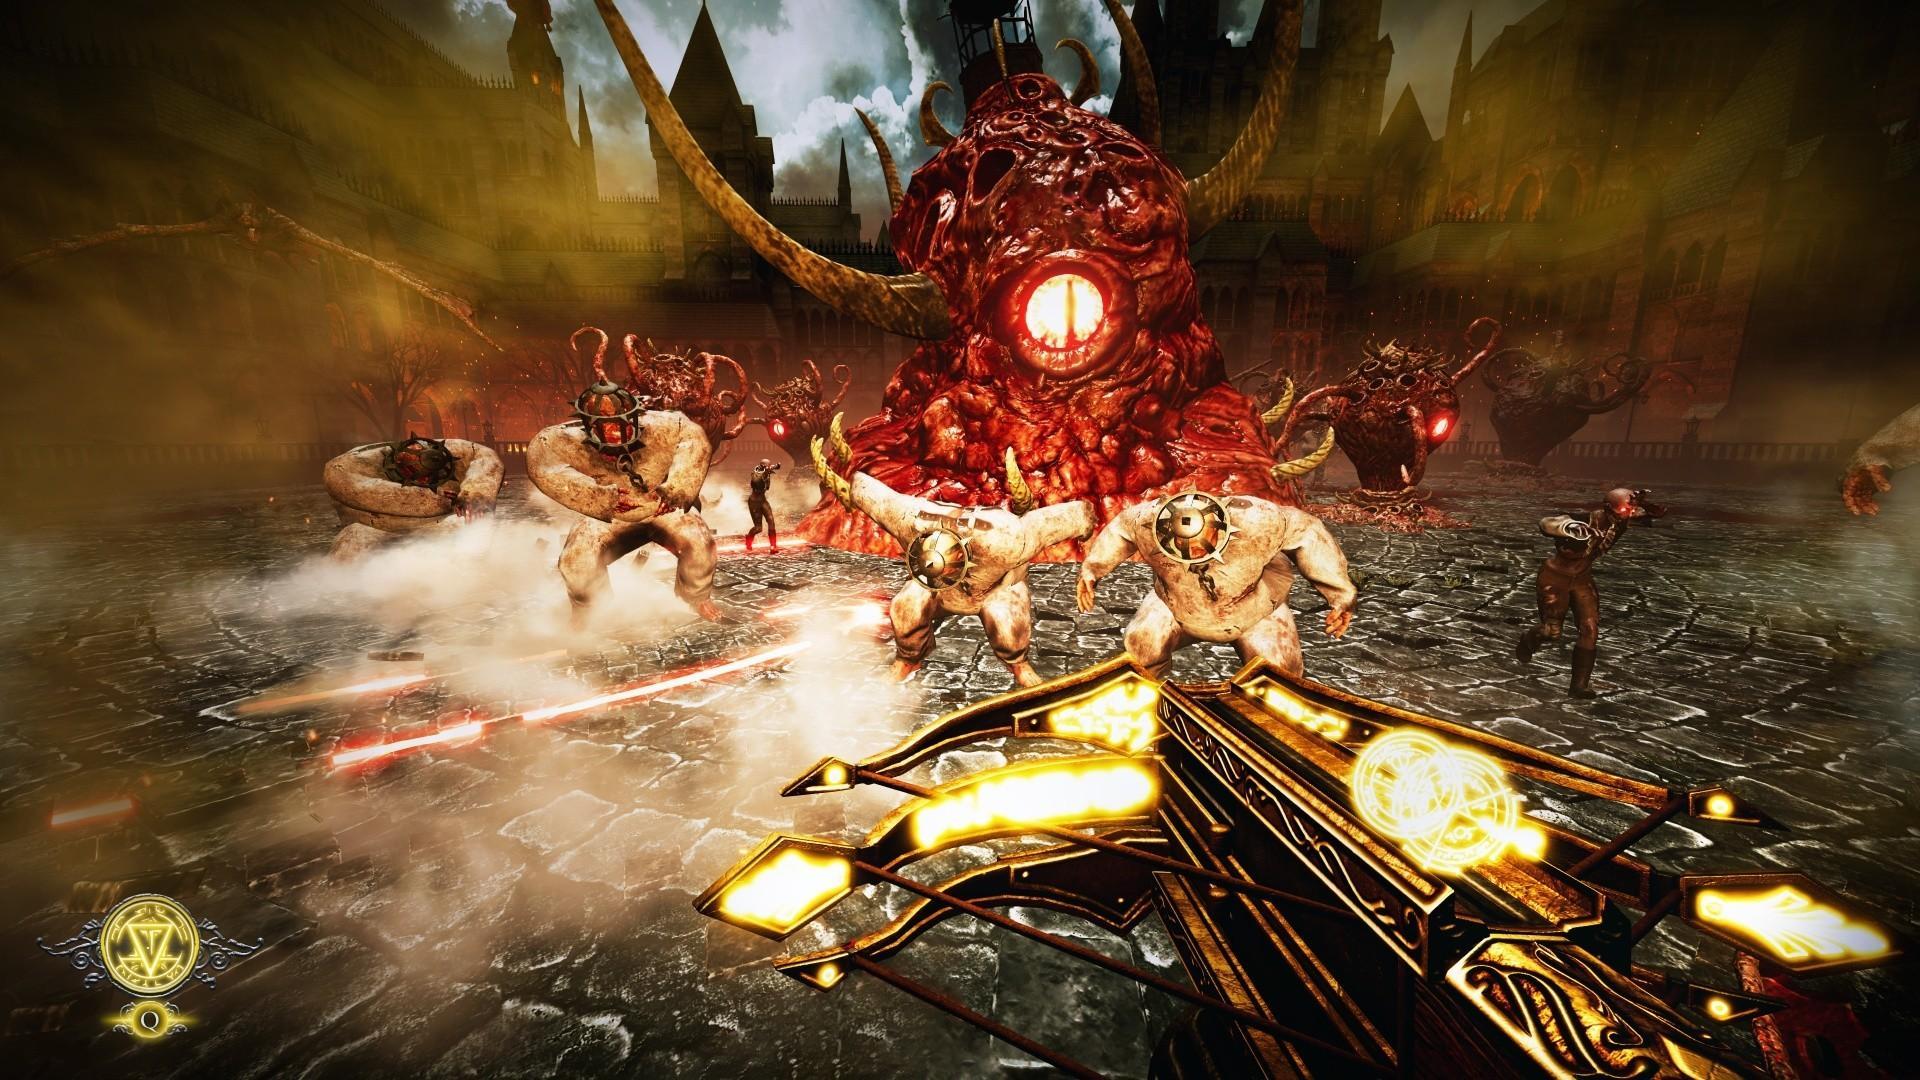 Арена-шутер Crossbow: Bloodnight готовится к релизу на гибридной платформе 6